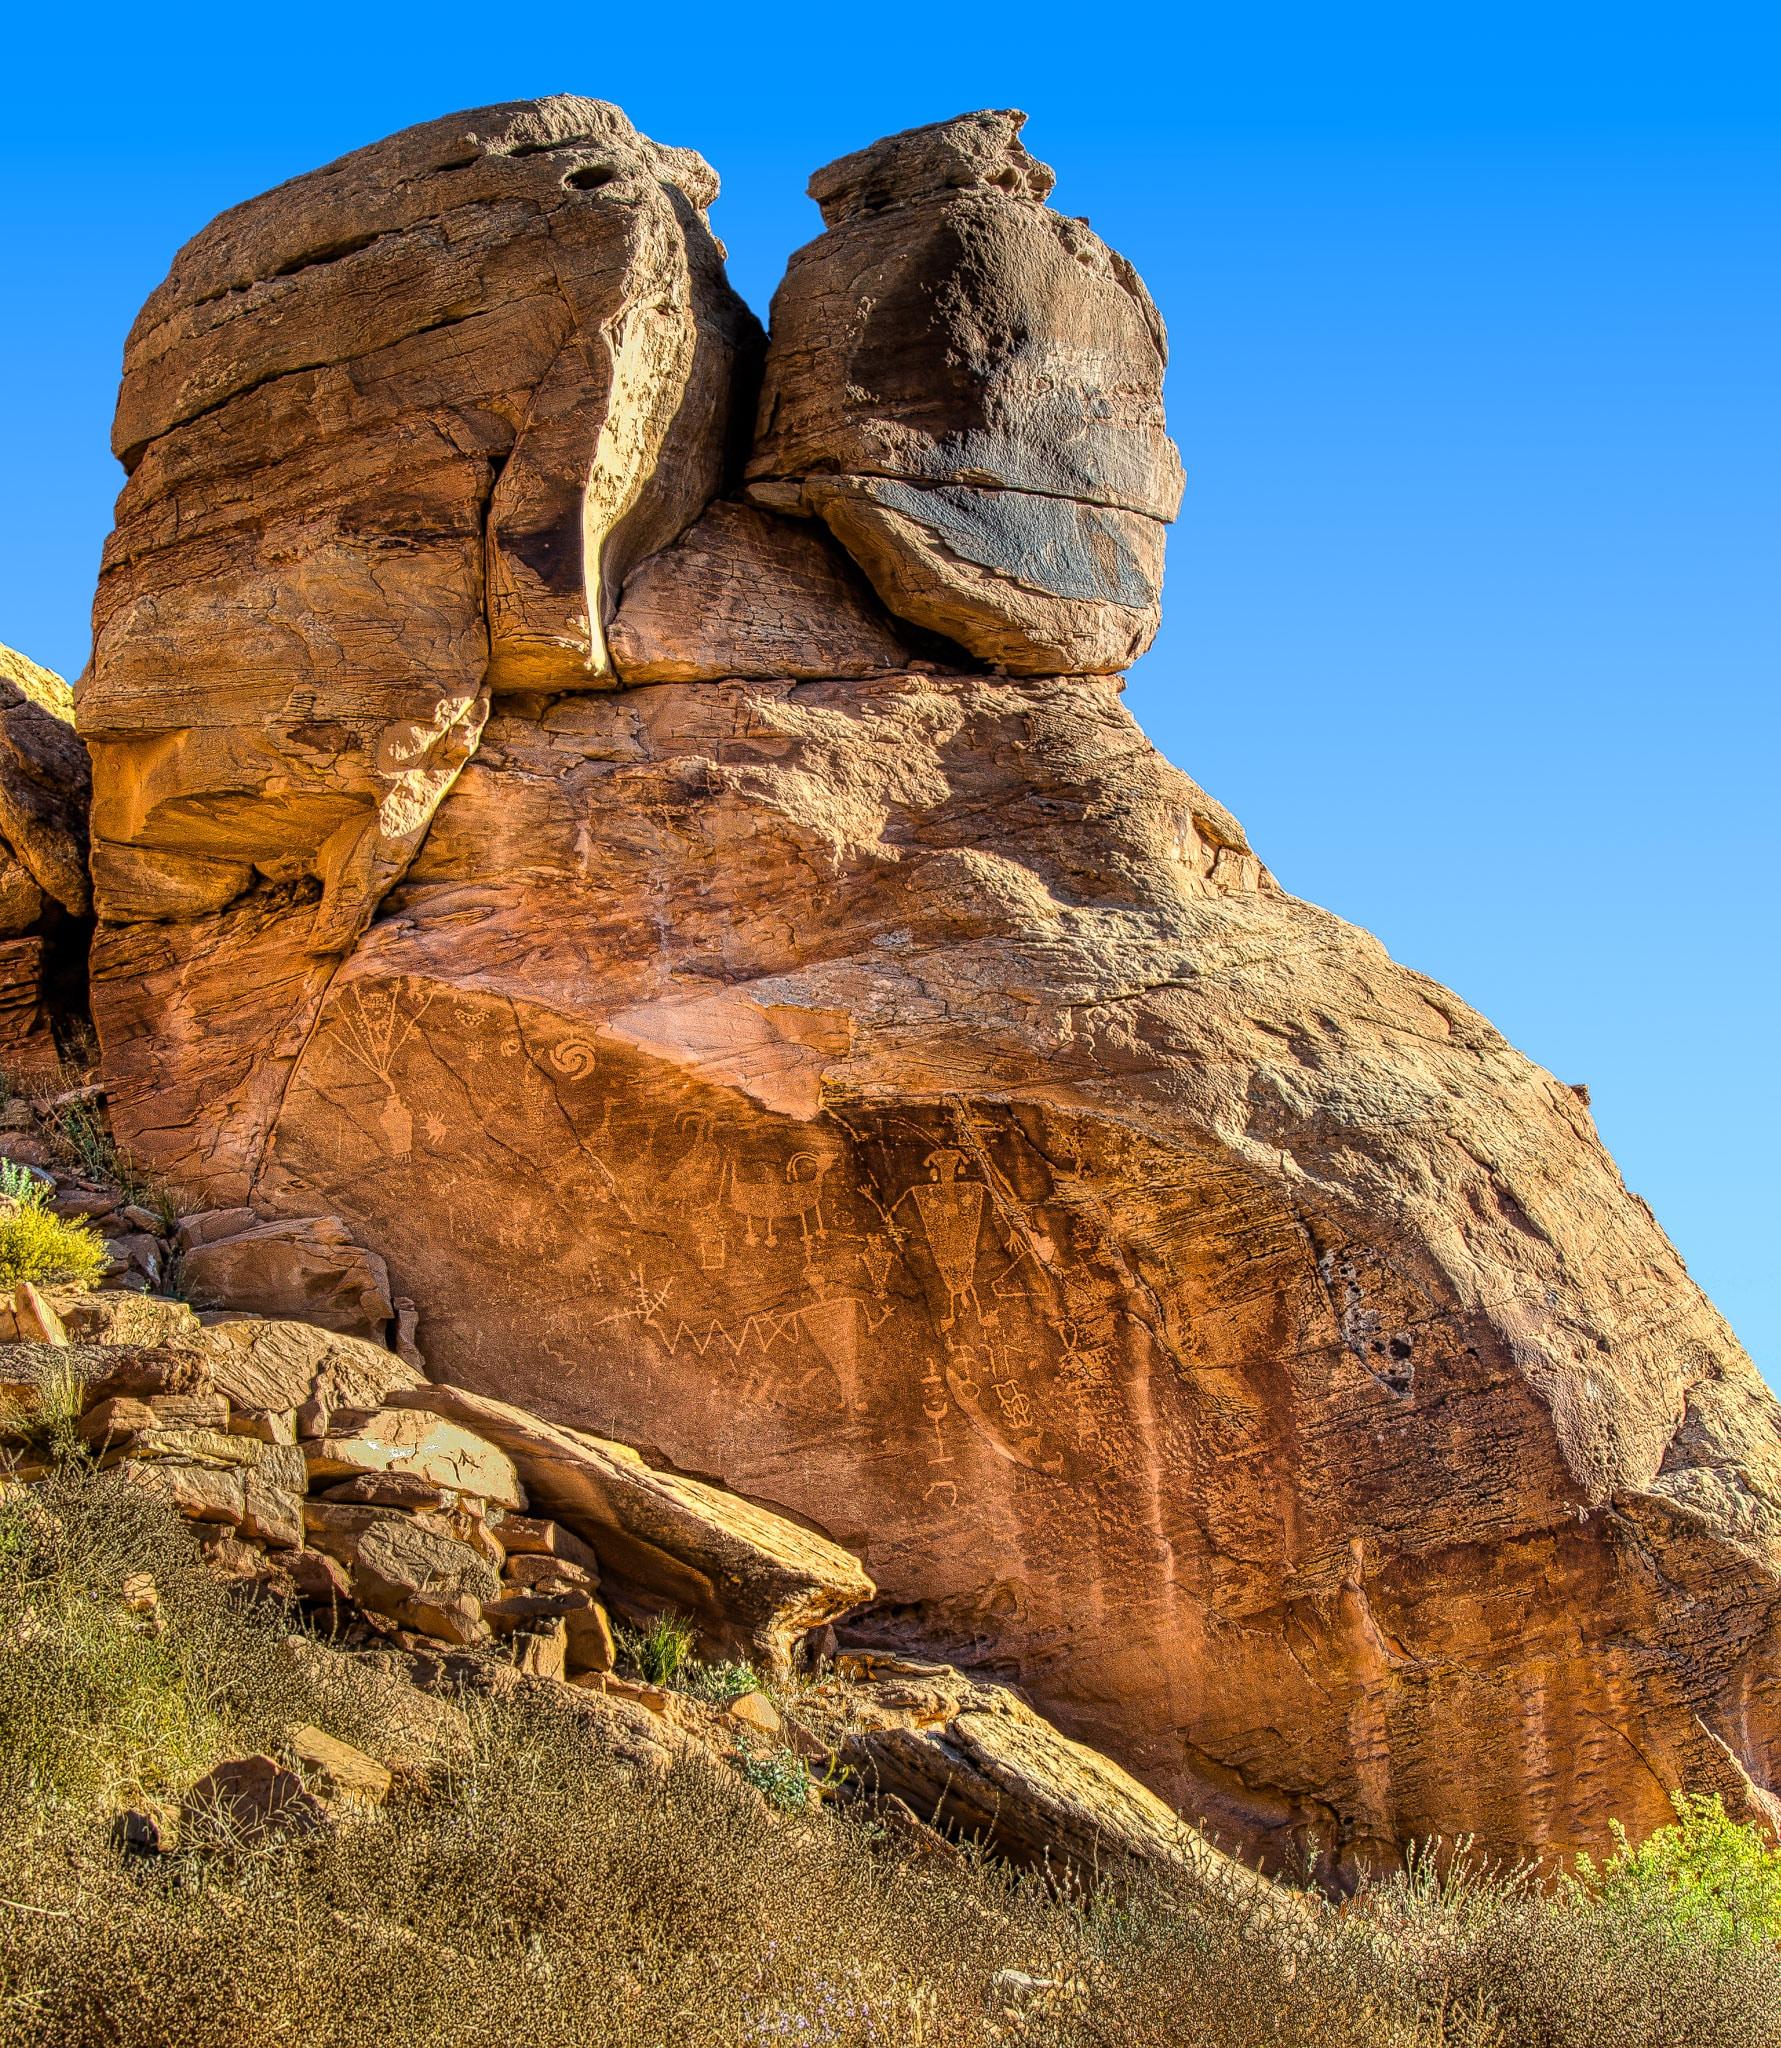 Petroglyphs on rock overlooking Cub Creek In Dinosaur National Monument.